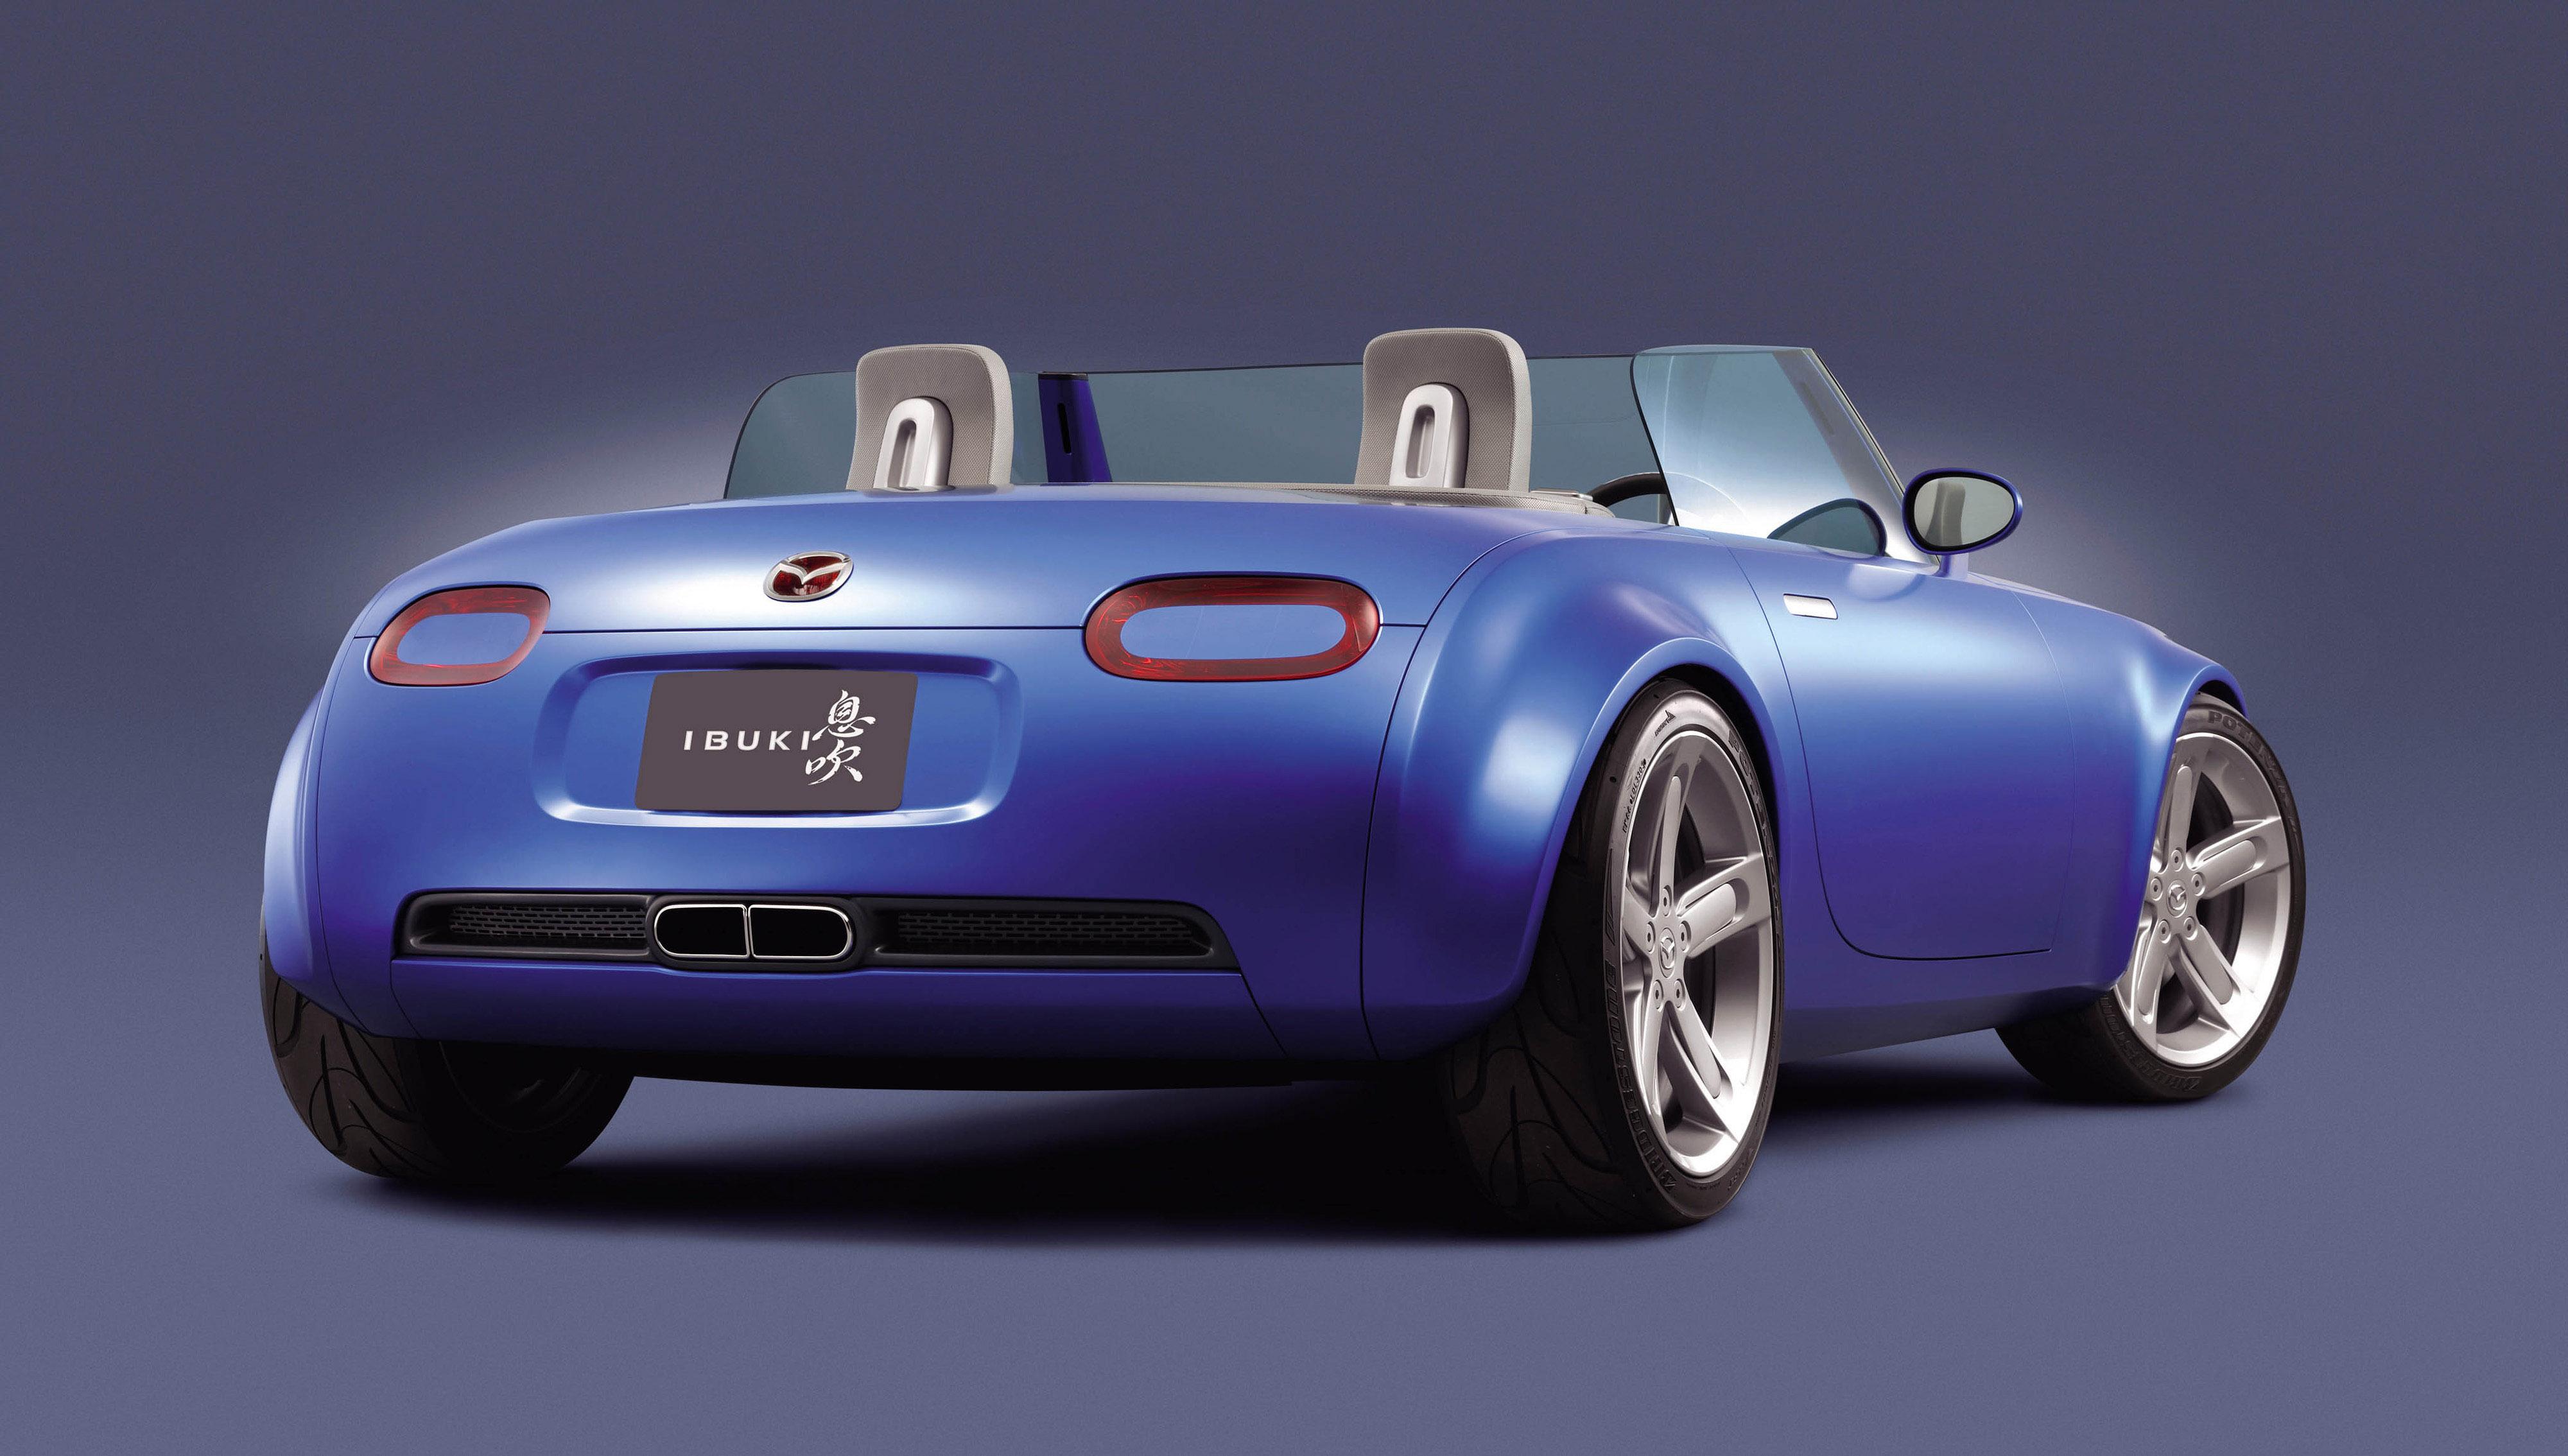 https://www.automobilesreview.com/gallery/mazda-ibuki-concept/mazda-ibuki-concept-08.jpg